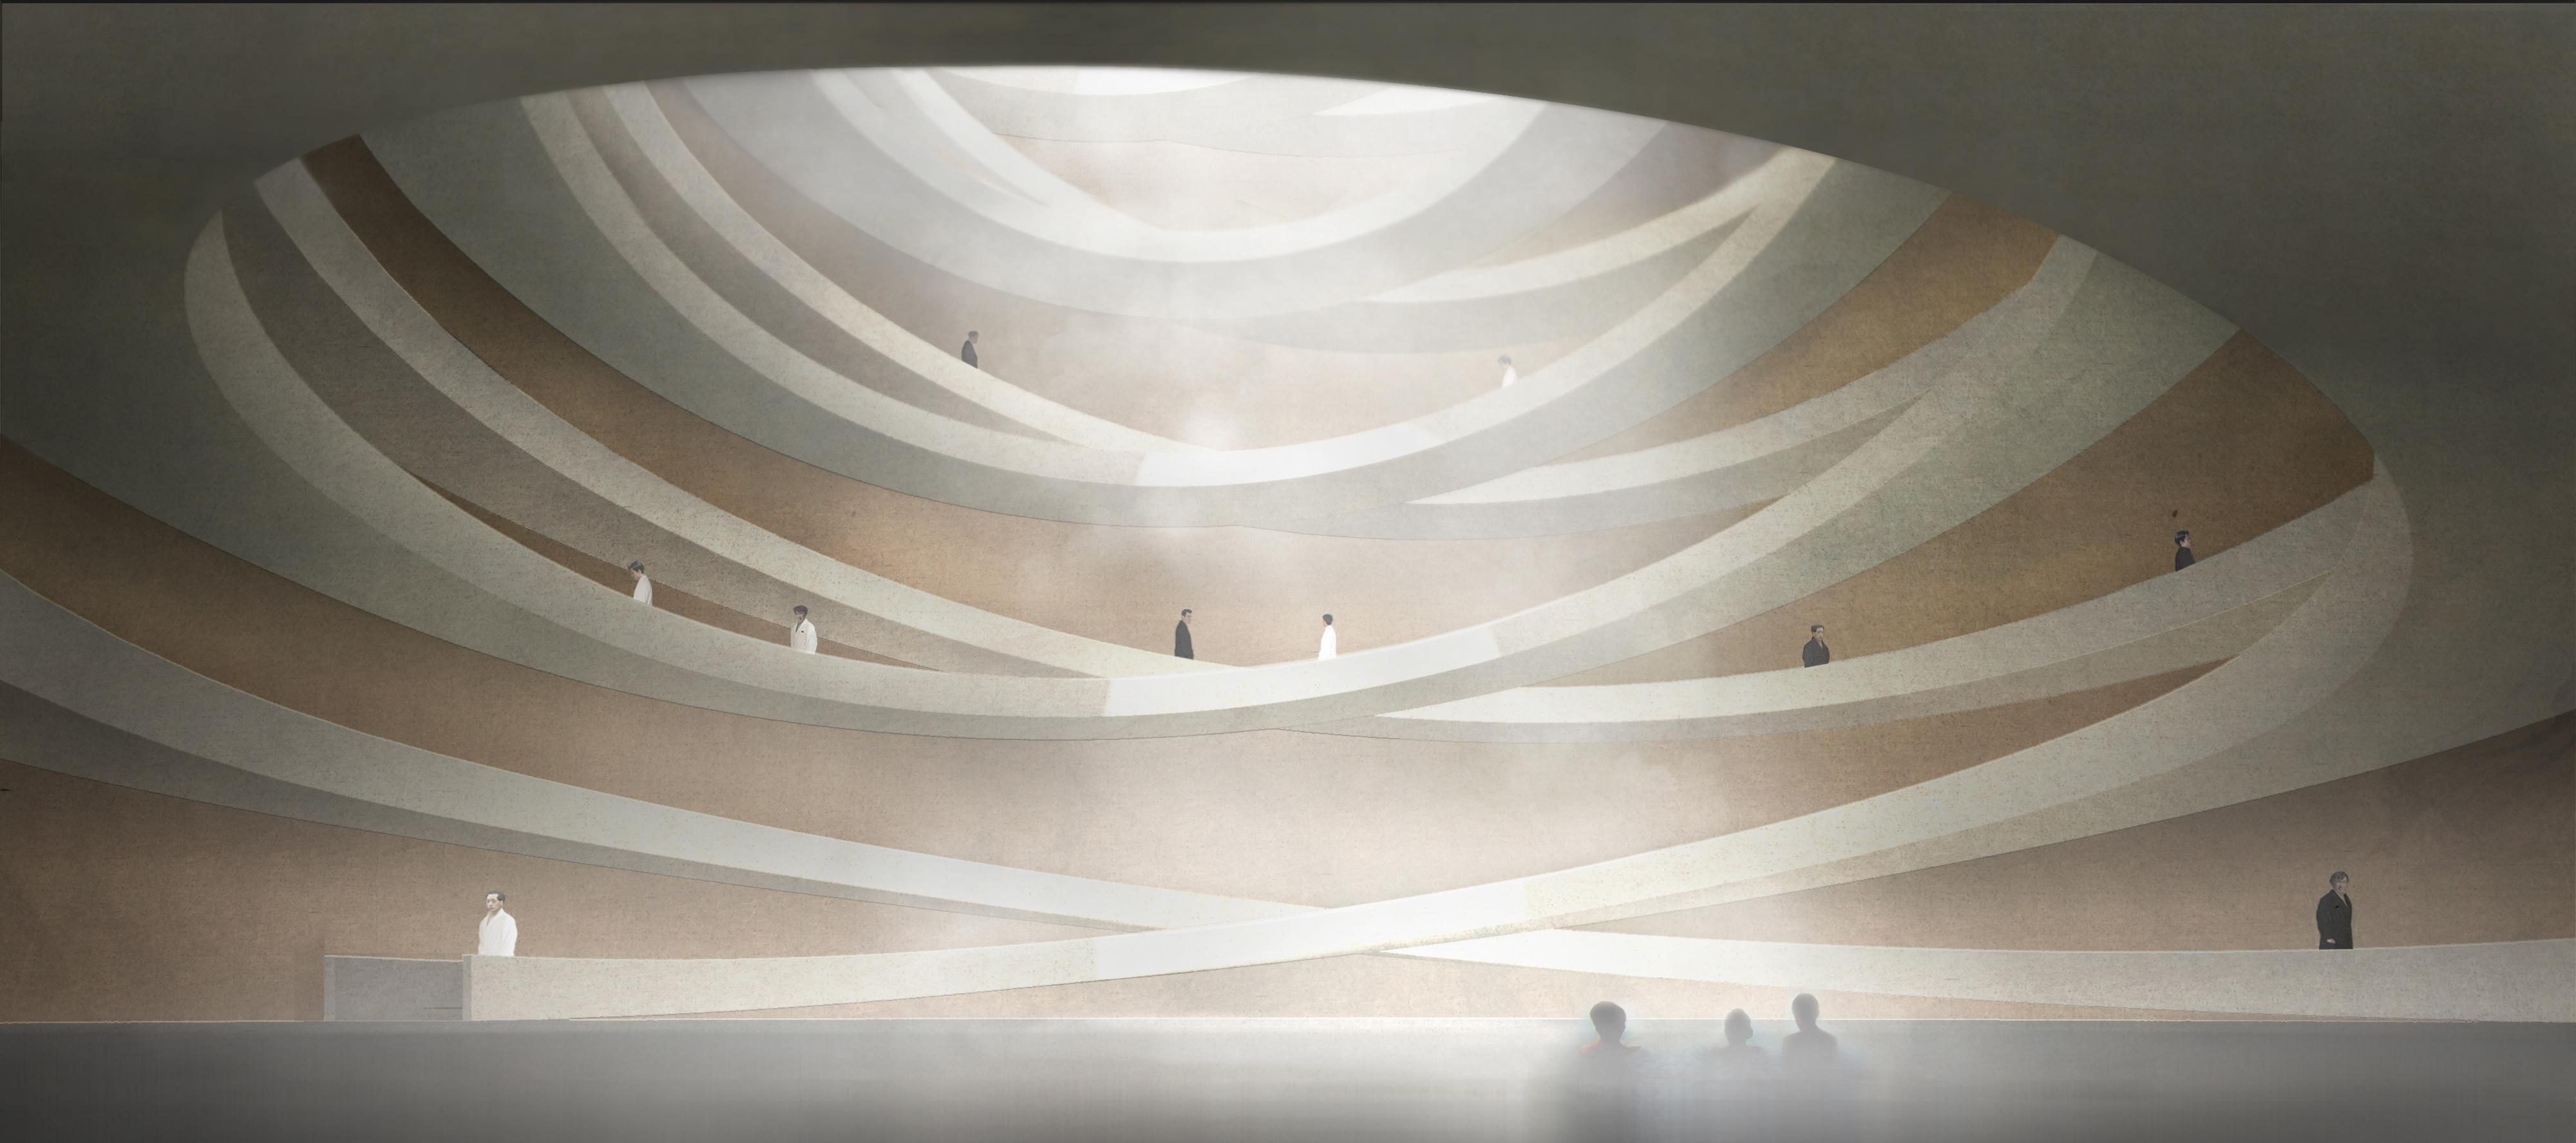 spiraling subterranean bathhouse in the dmz cnn style